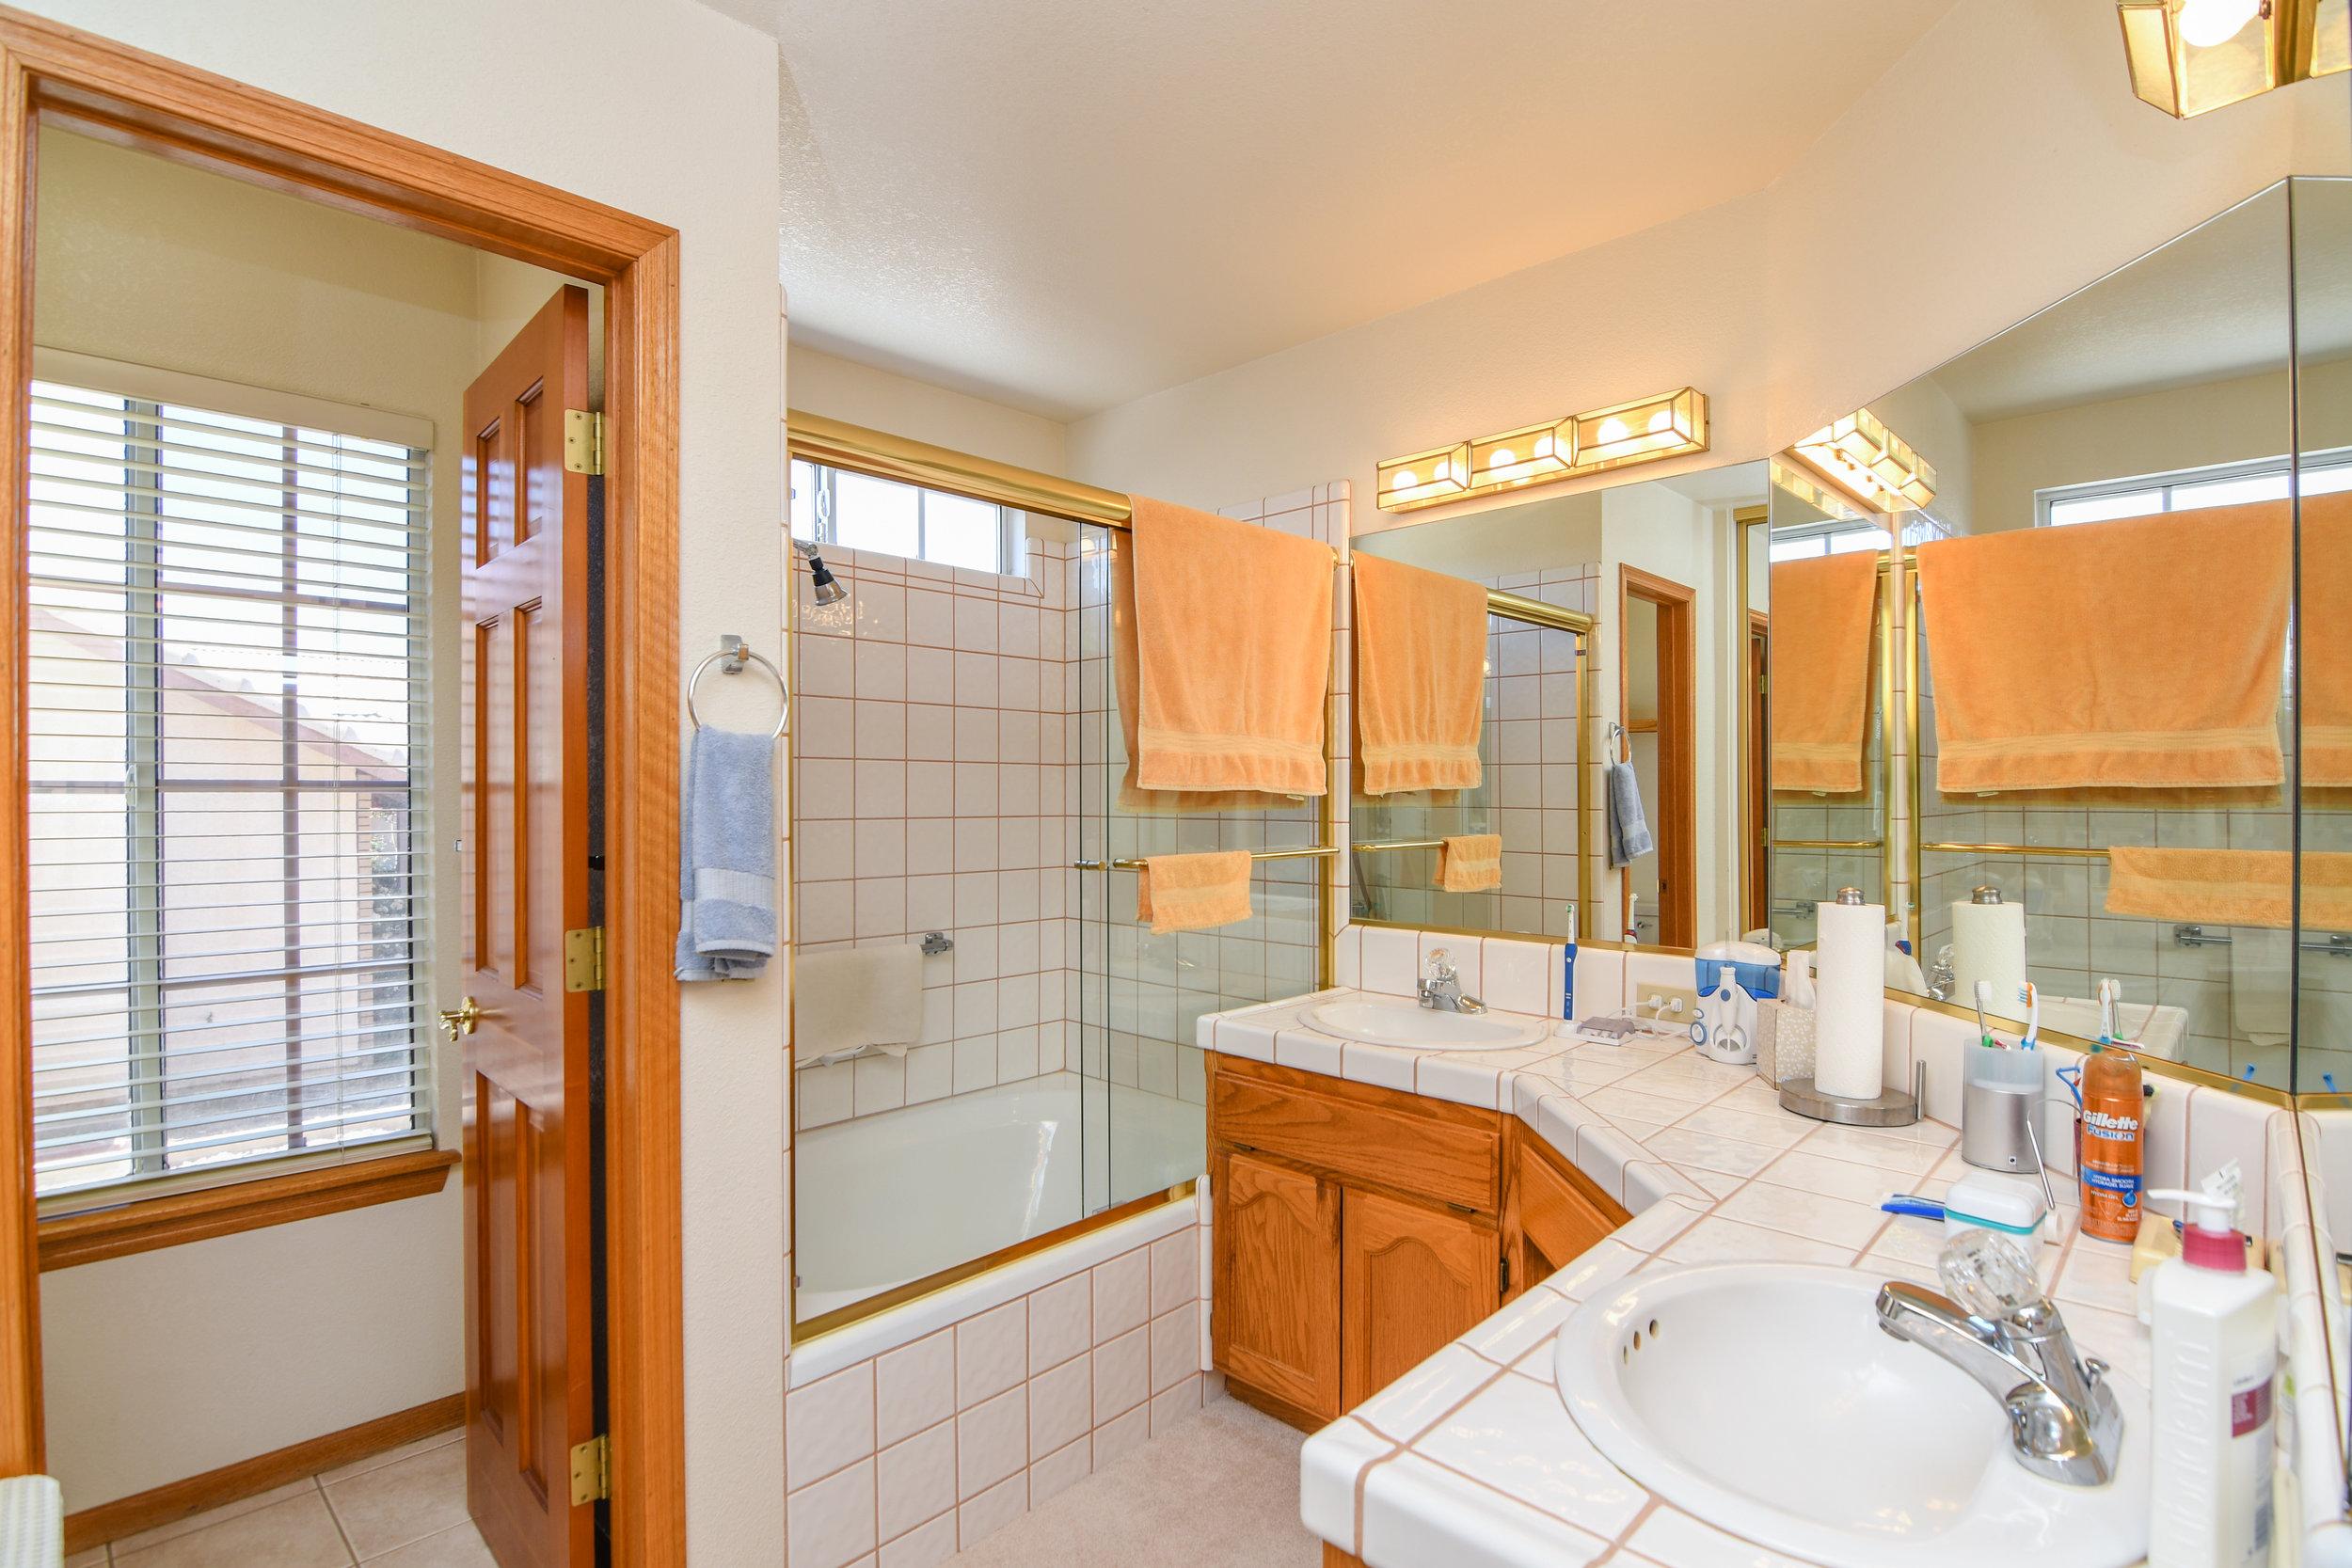 25 - Master Bathroom.jpeg